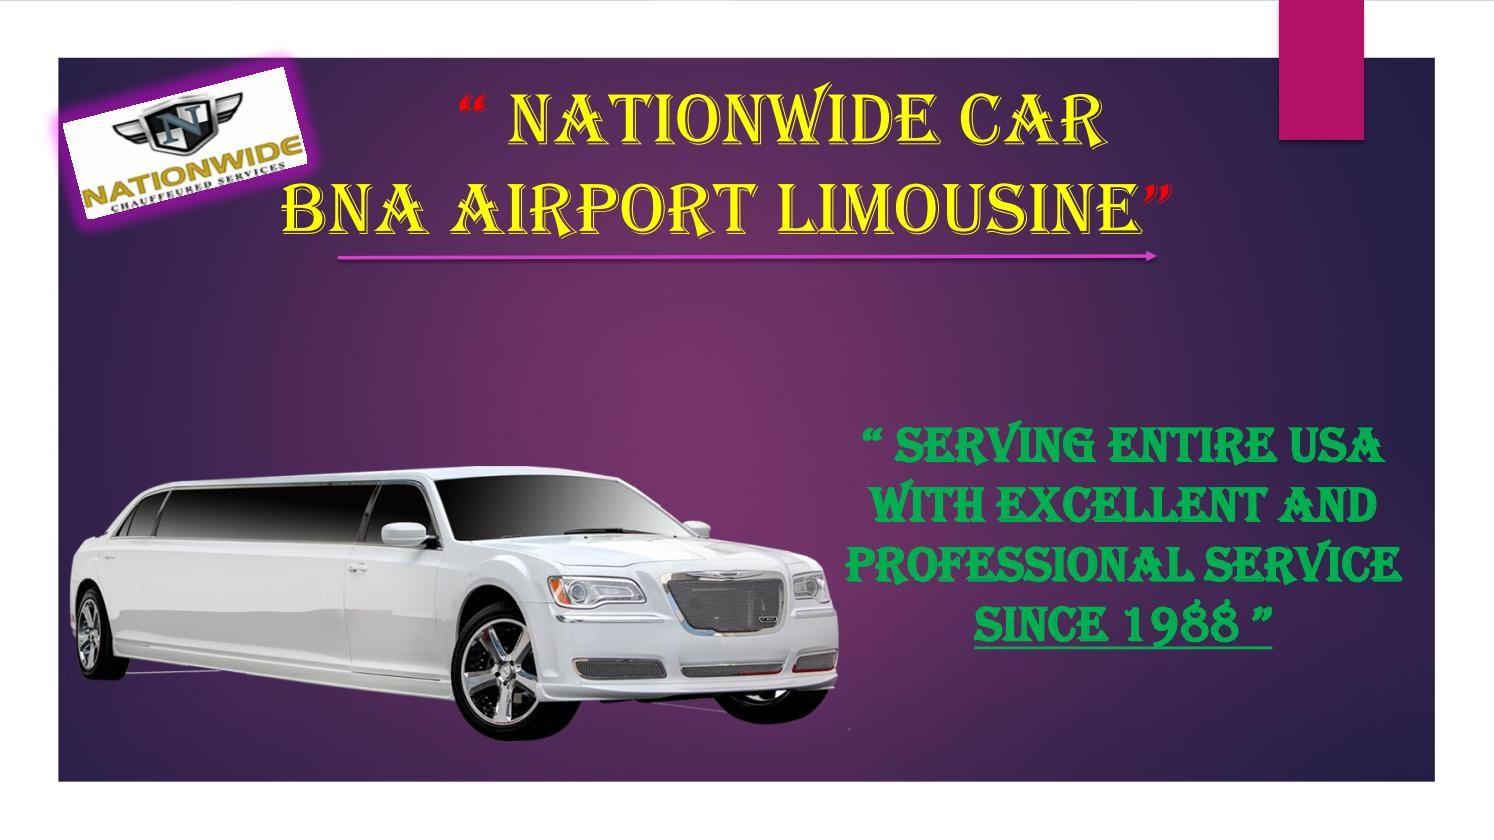 Bna airport limousine Professional services, Limo, Car